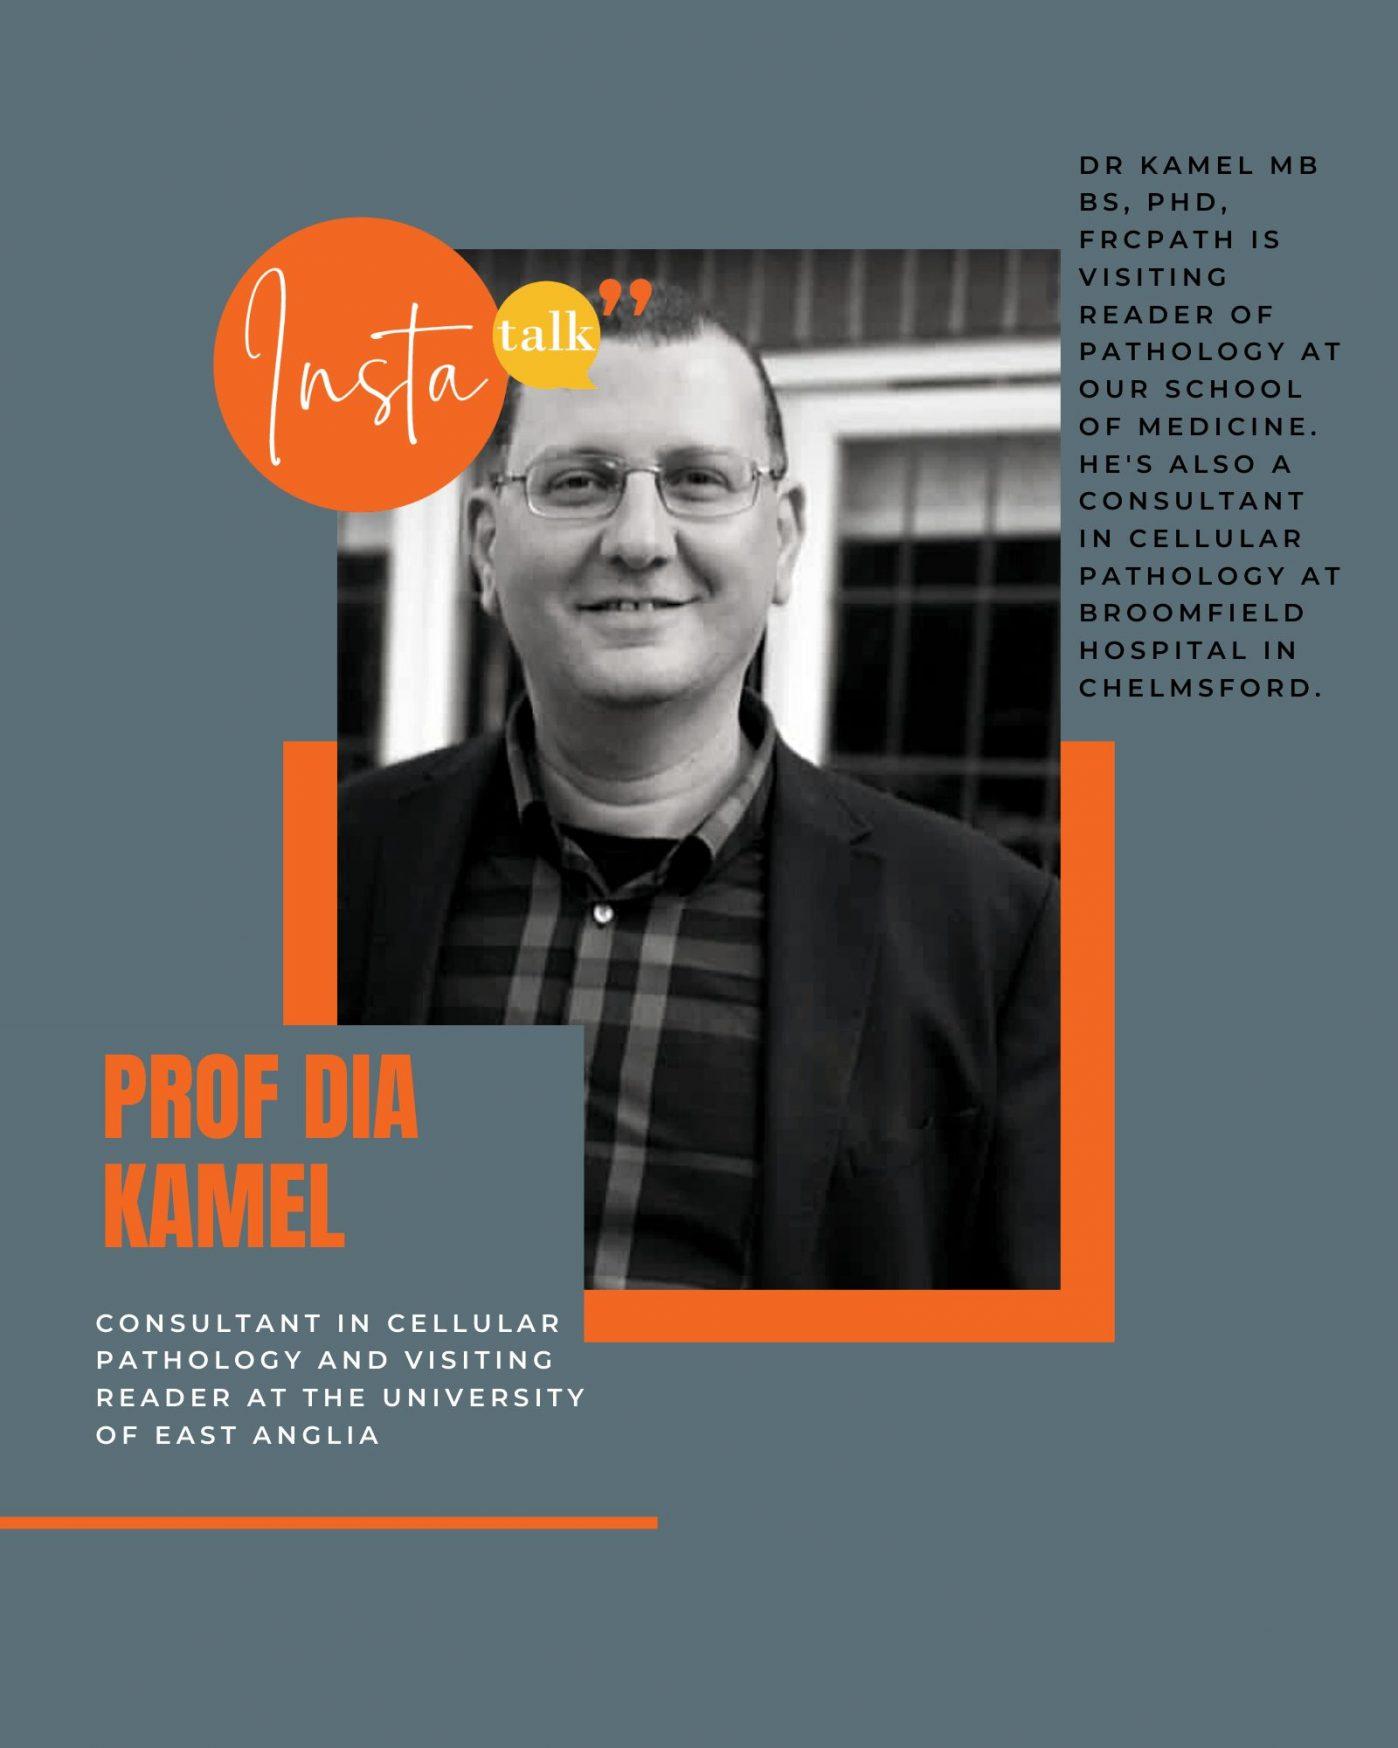 Prof Dia Kamel